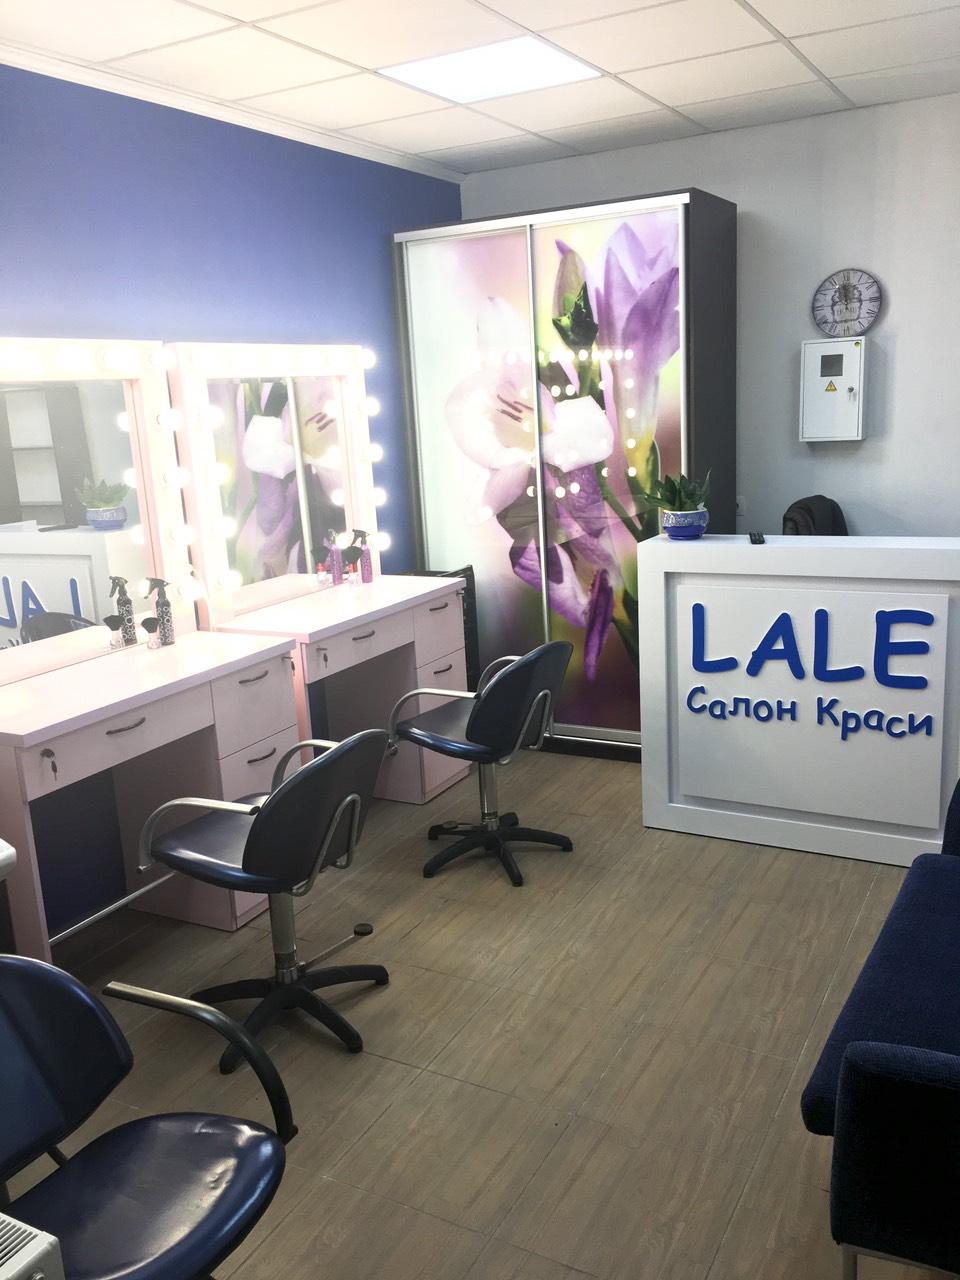 Салон красоты LALE